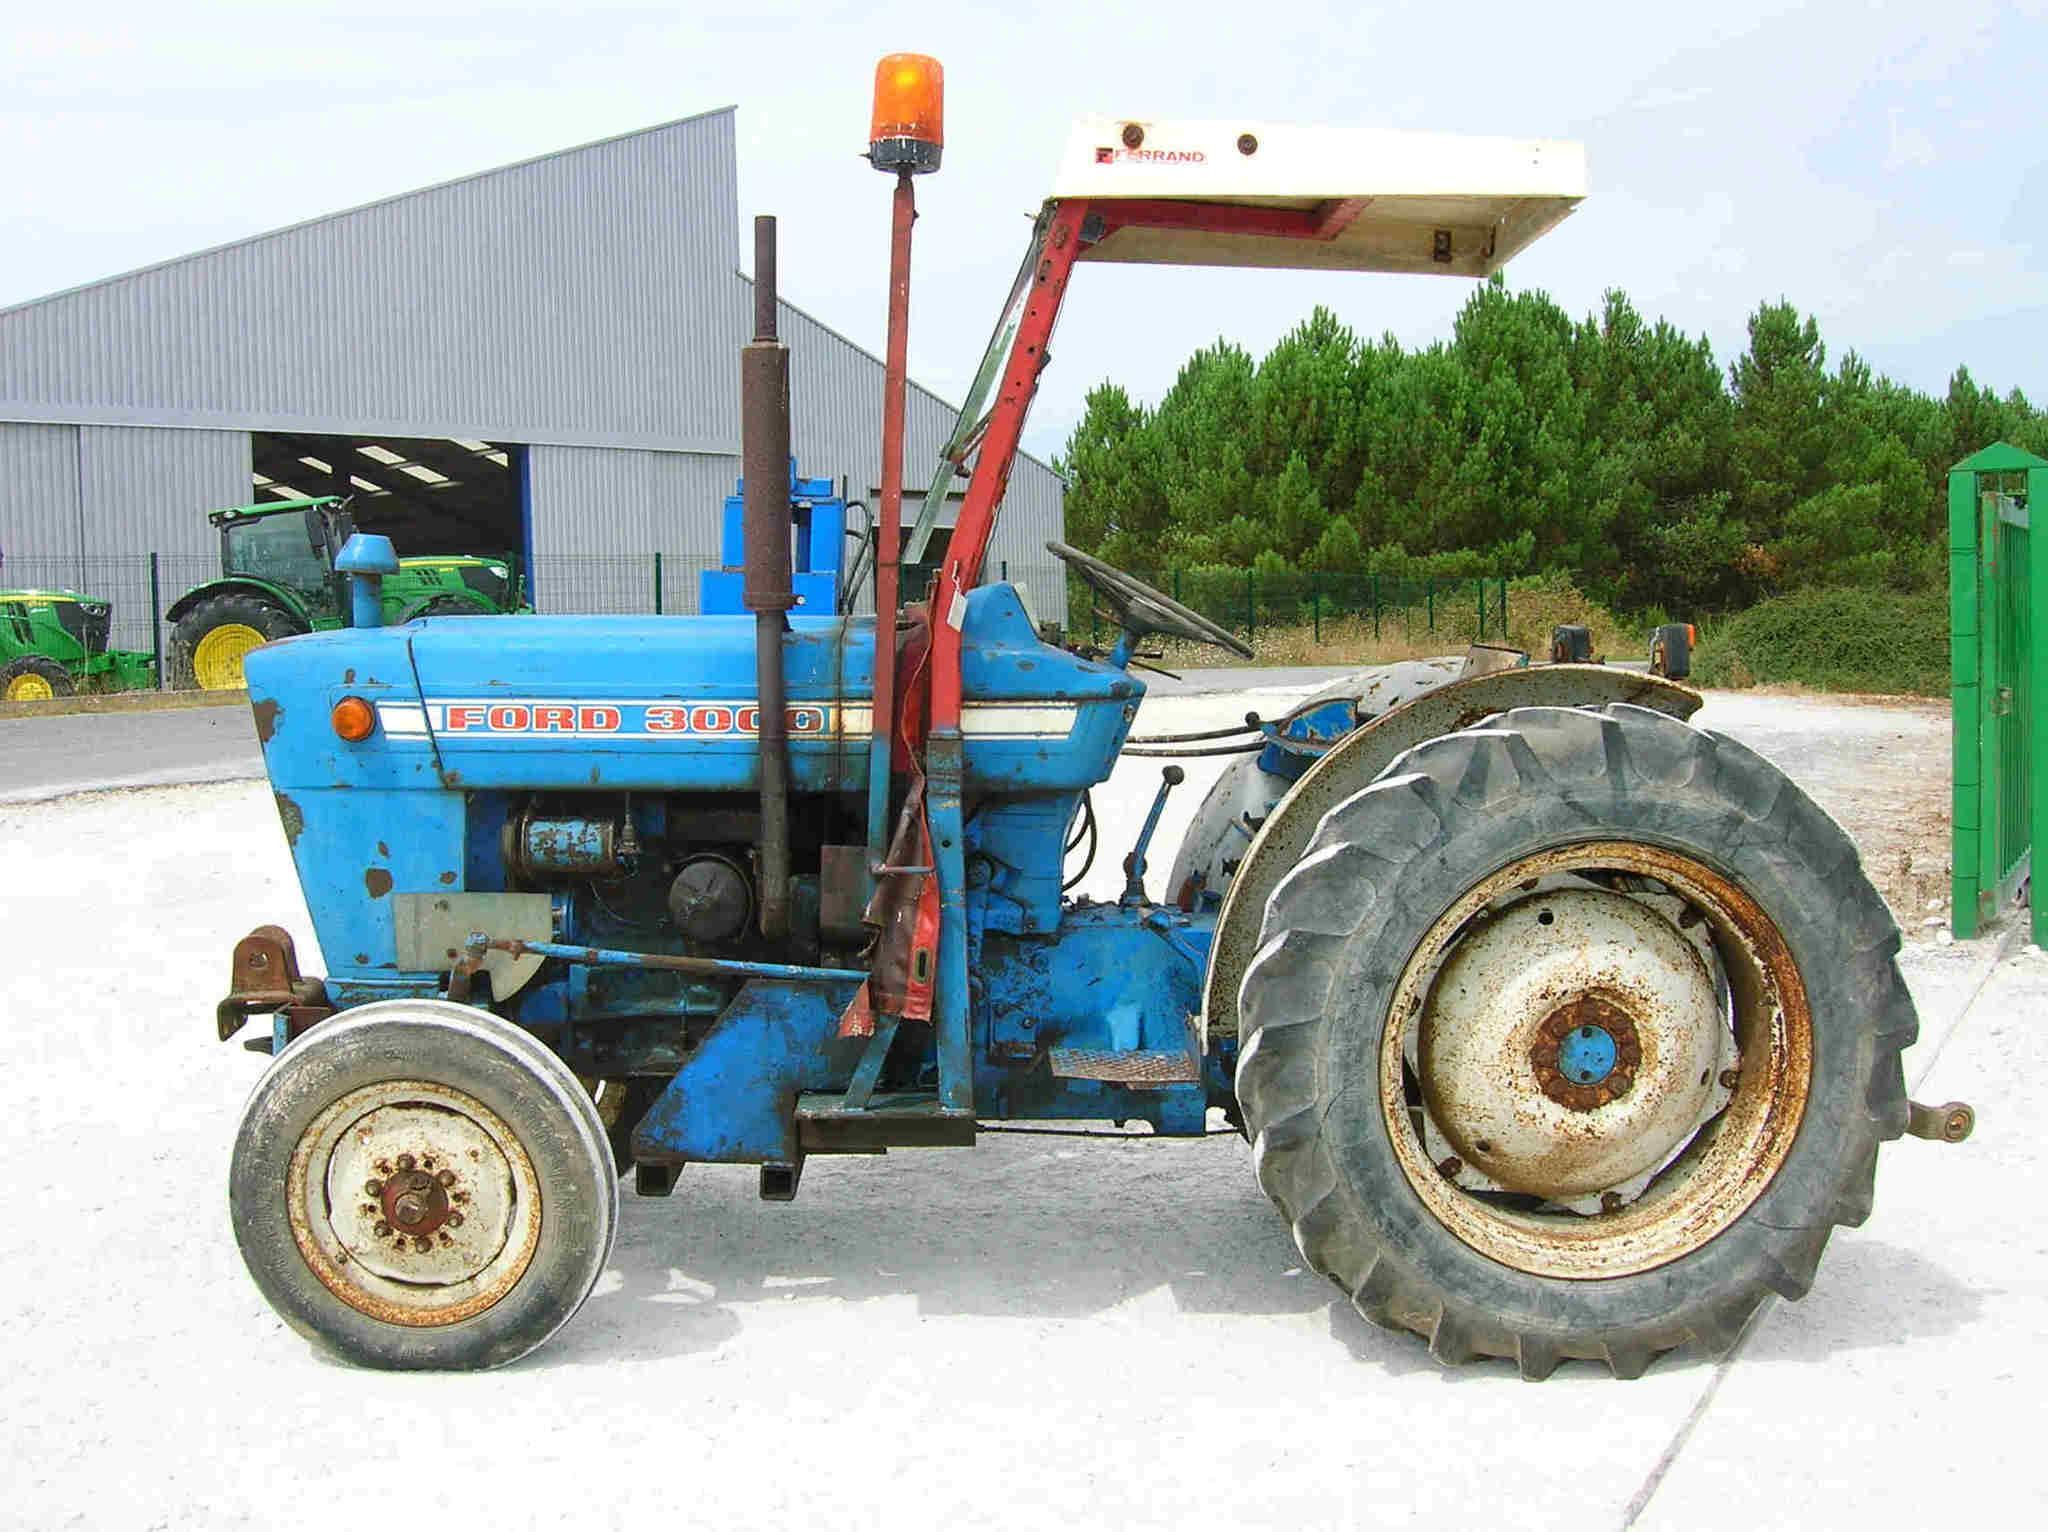 tracteur fruitier ford 3000 vendre sur guenon. Black Bedroom Furniture Sets. Home Design Ideas